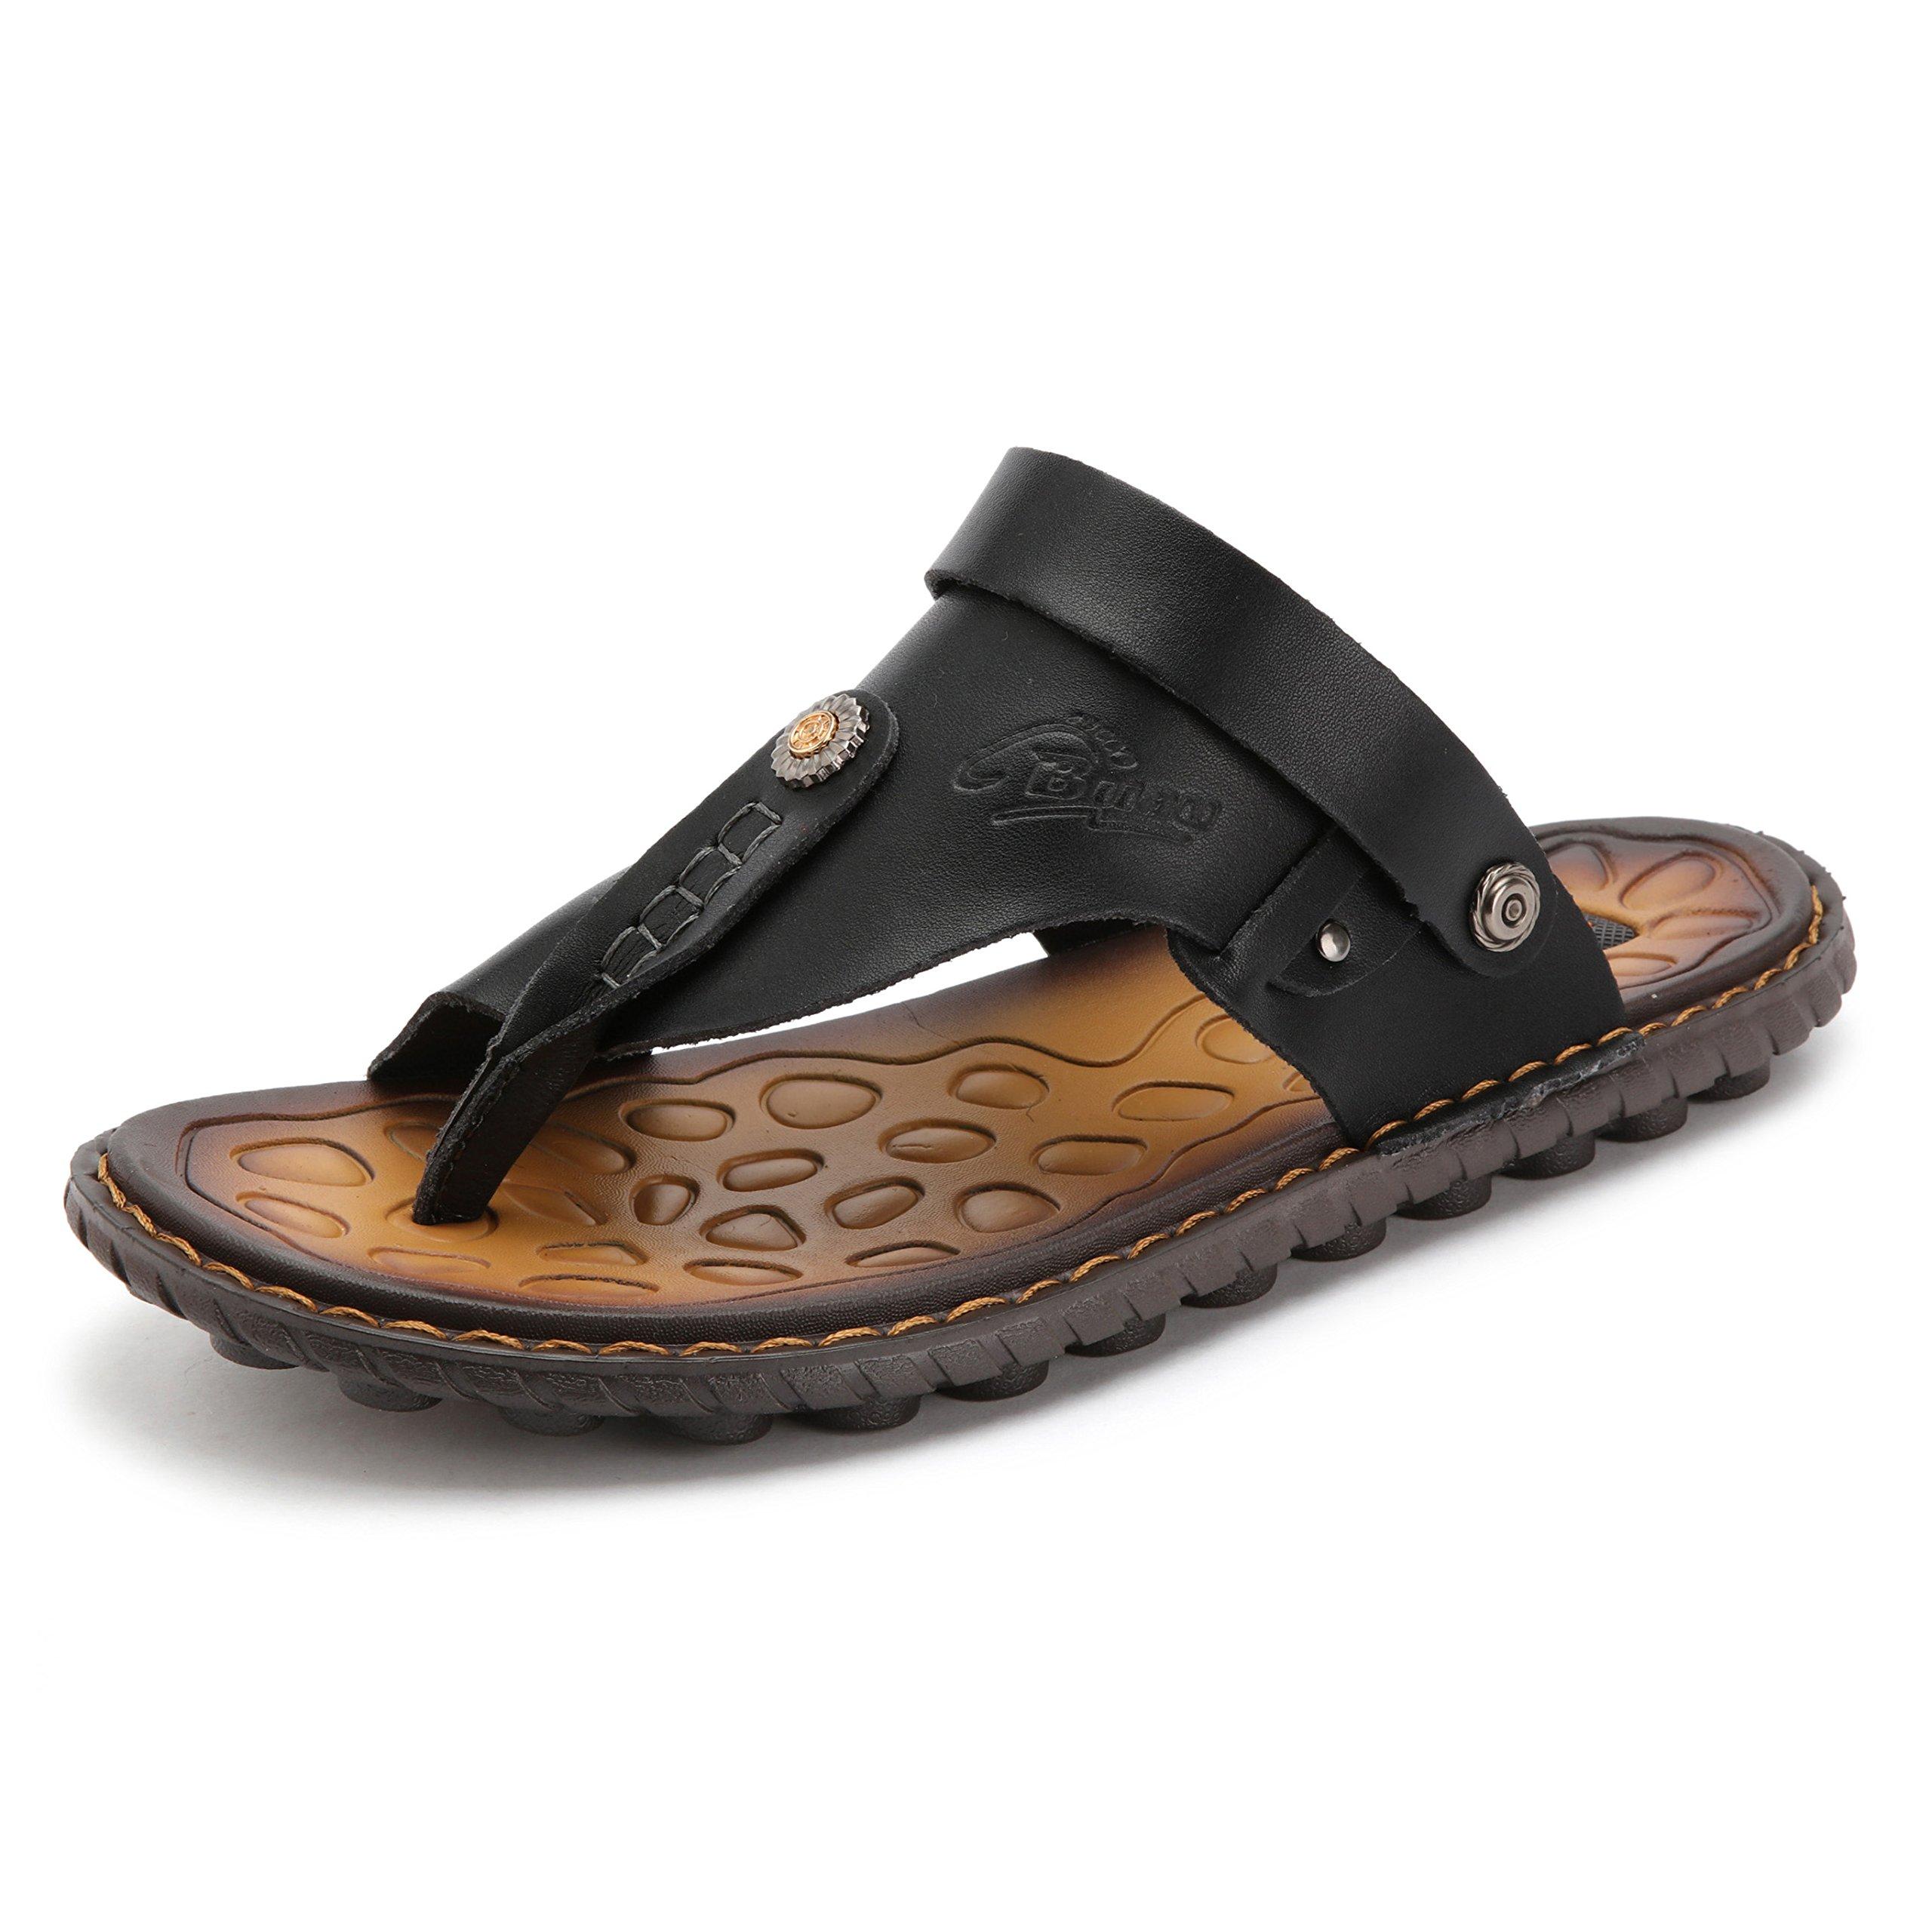 OHCHSH Sandals for Mens Leather Slippers Boy Slip On Sandles Flip Flops Thong US Size 9